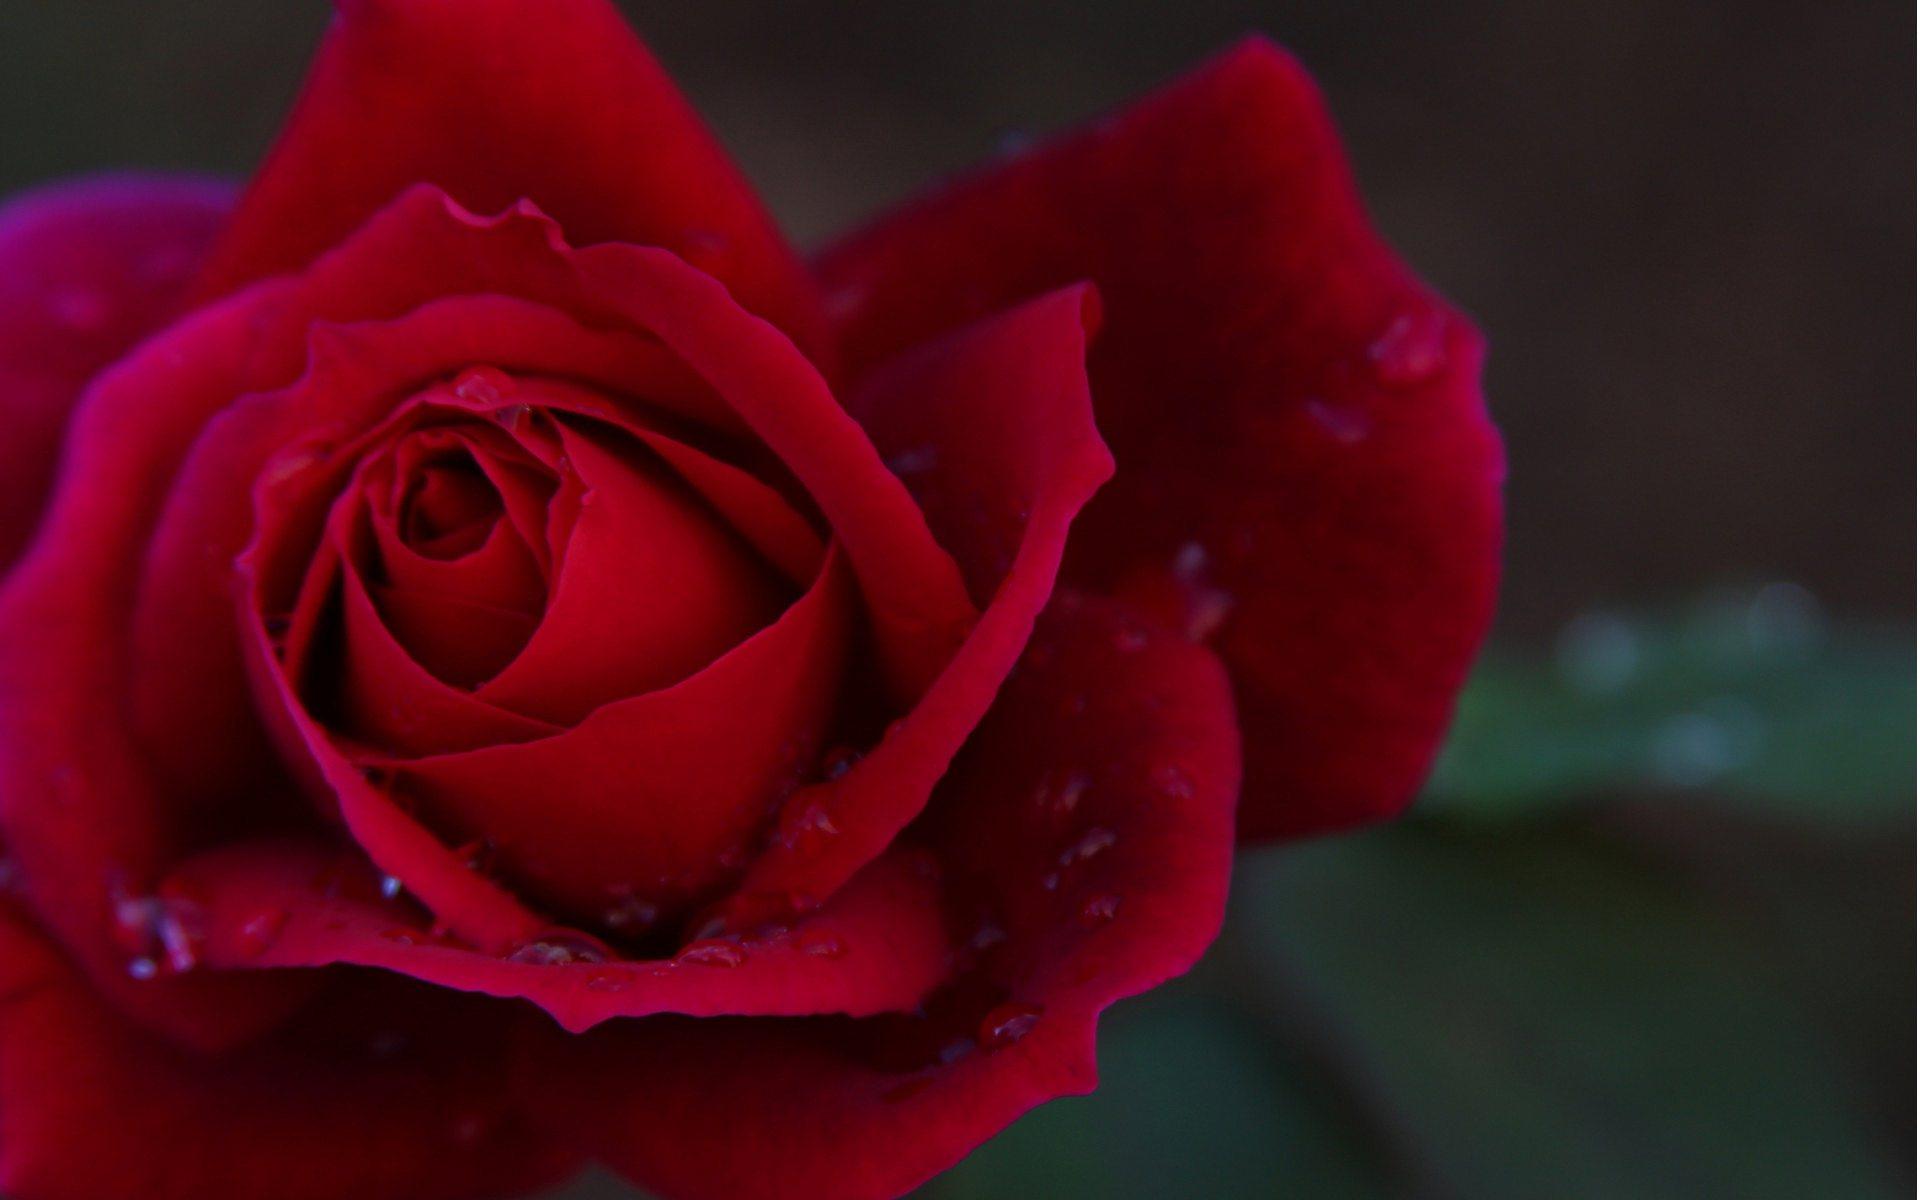 koleksi gambar mawar terkeren